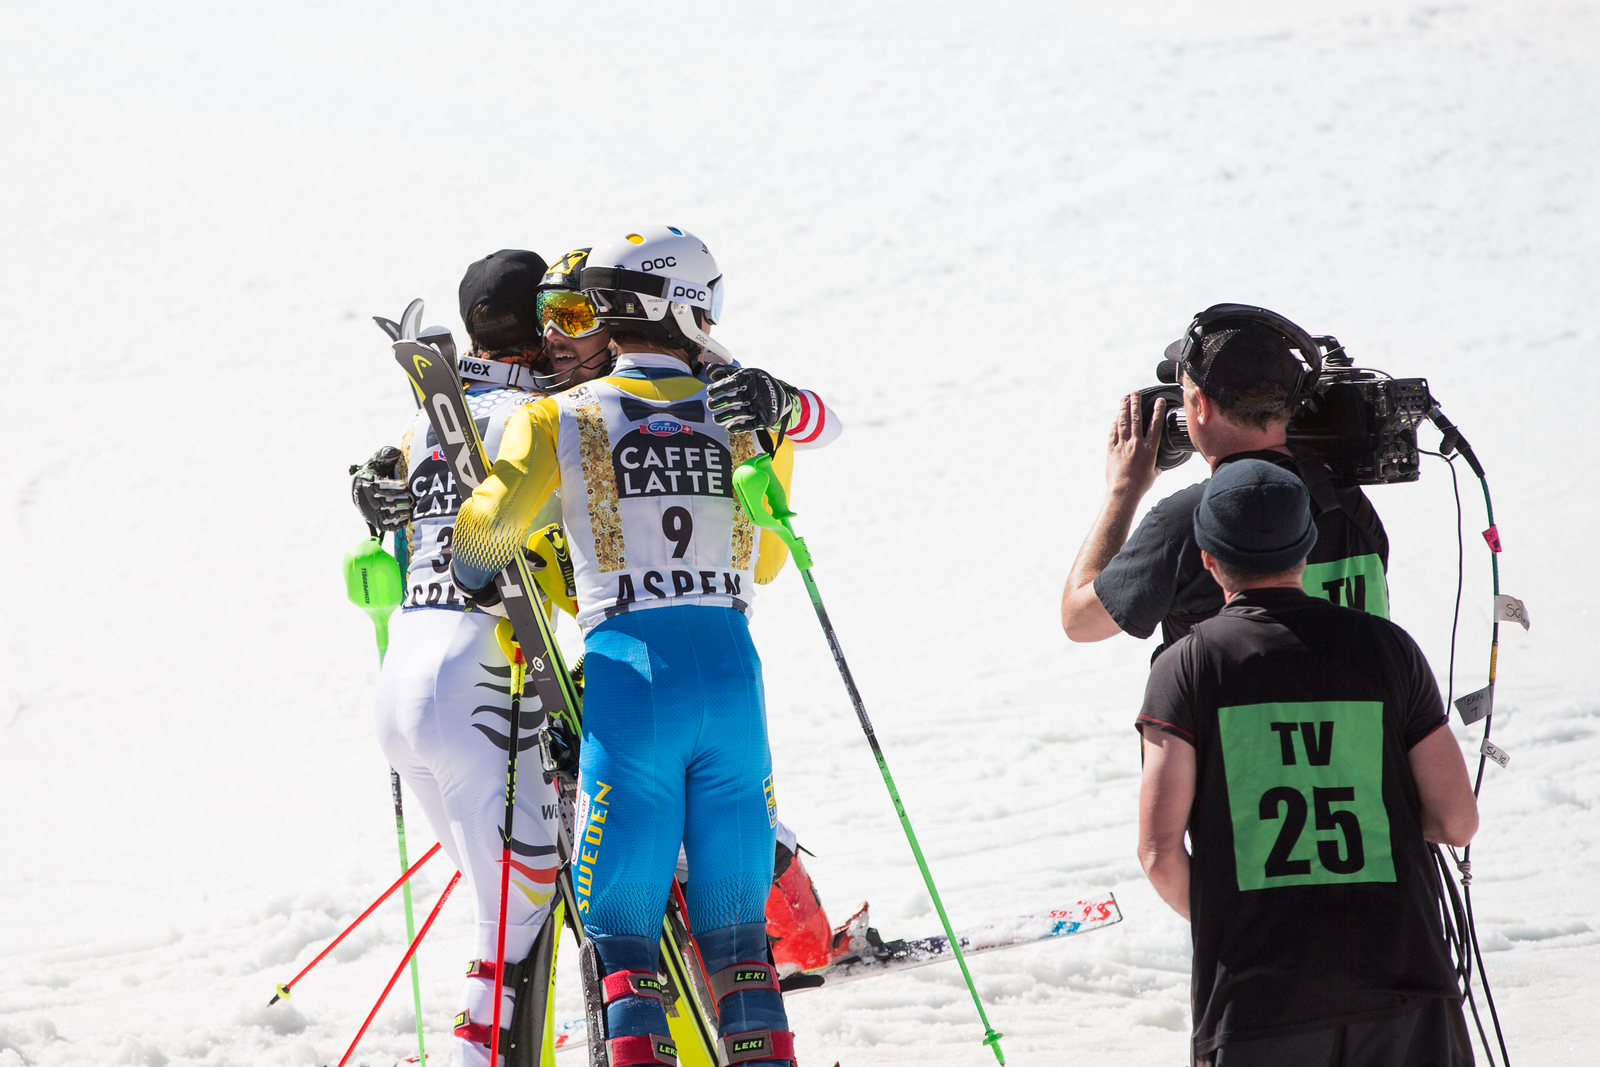 Marcel HIrscher, Felix Neureuther and Andrew Myhrer Slalom 2017 Audi FIS Ski World Cup finals in Aspen, CO. Photo: U.S. Ski Team